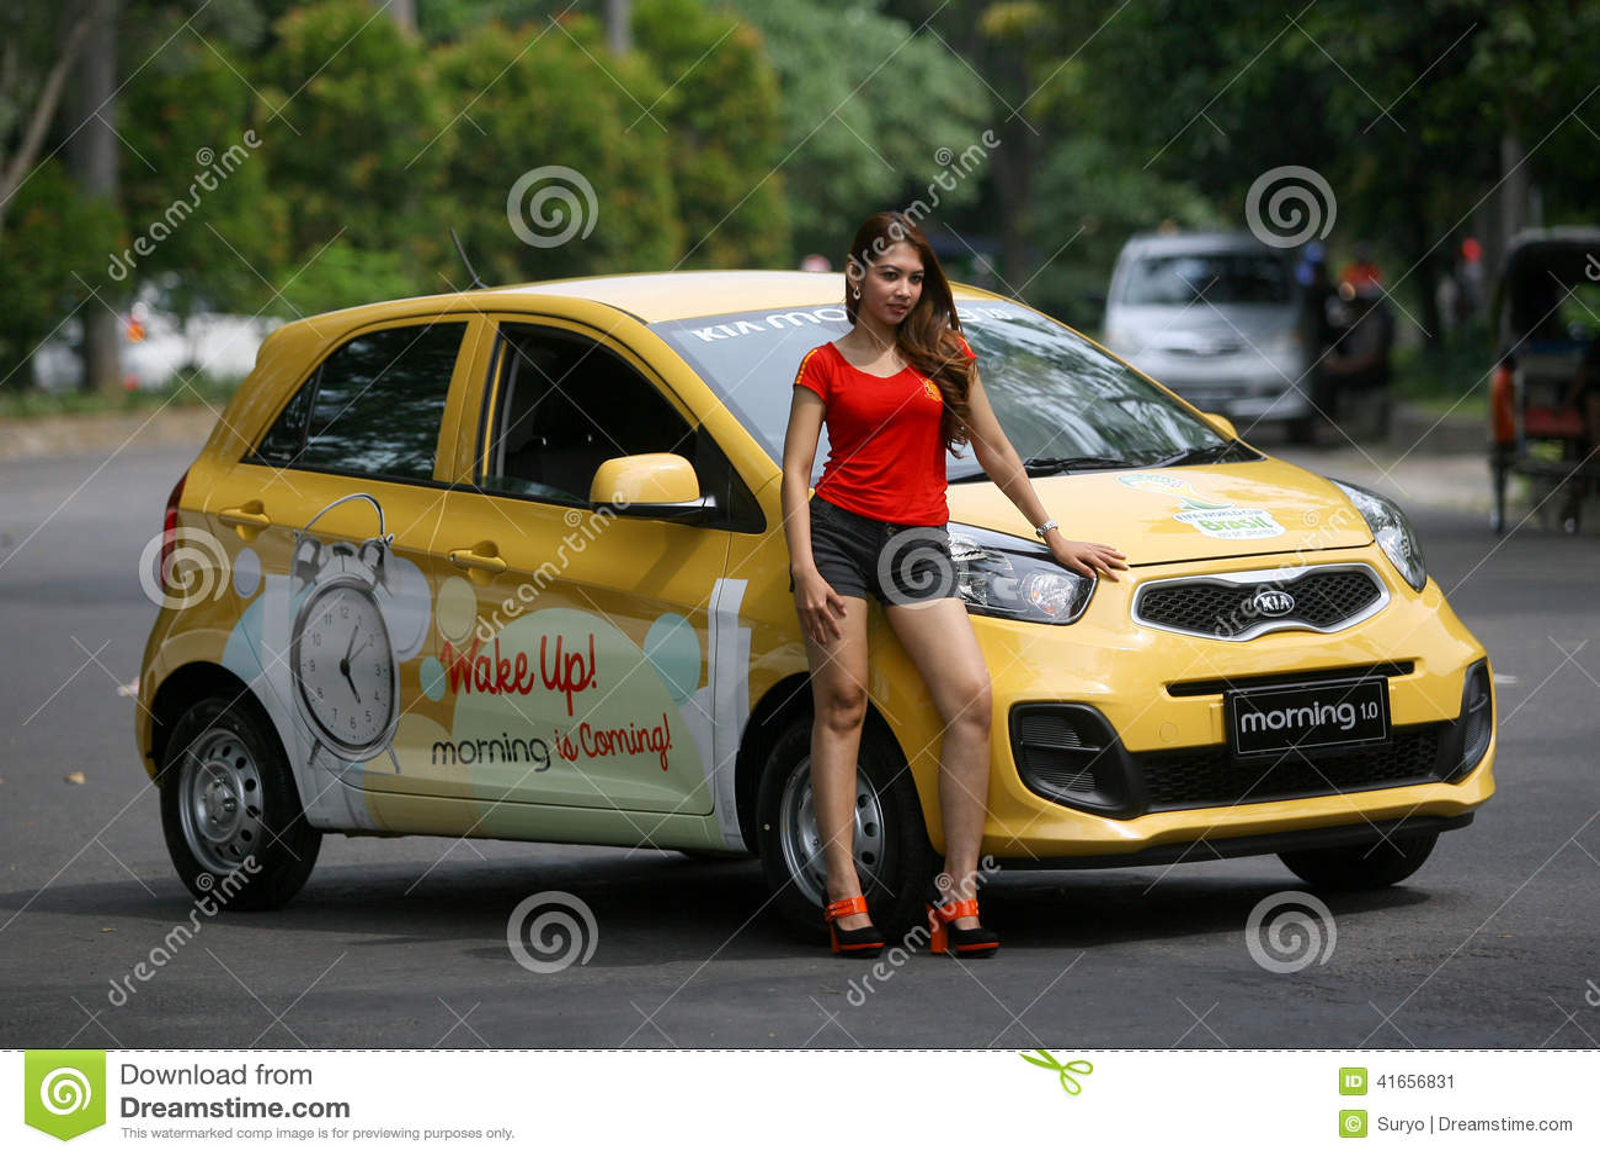 City Car Editorial Photo Image 41656831